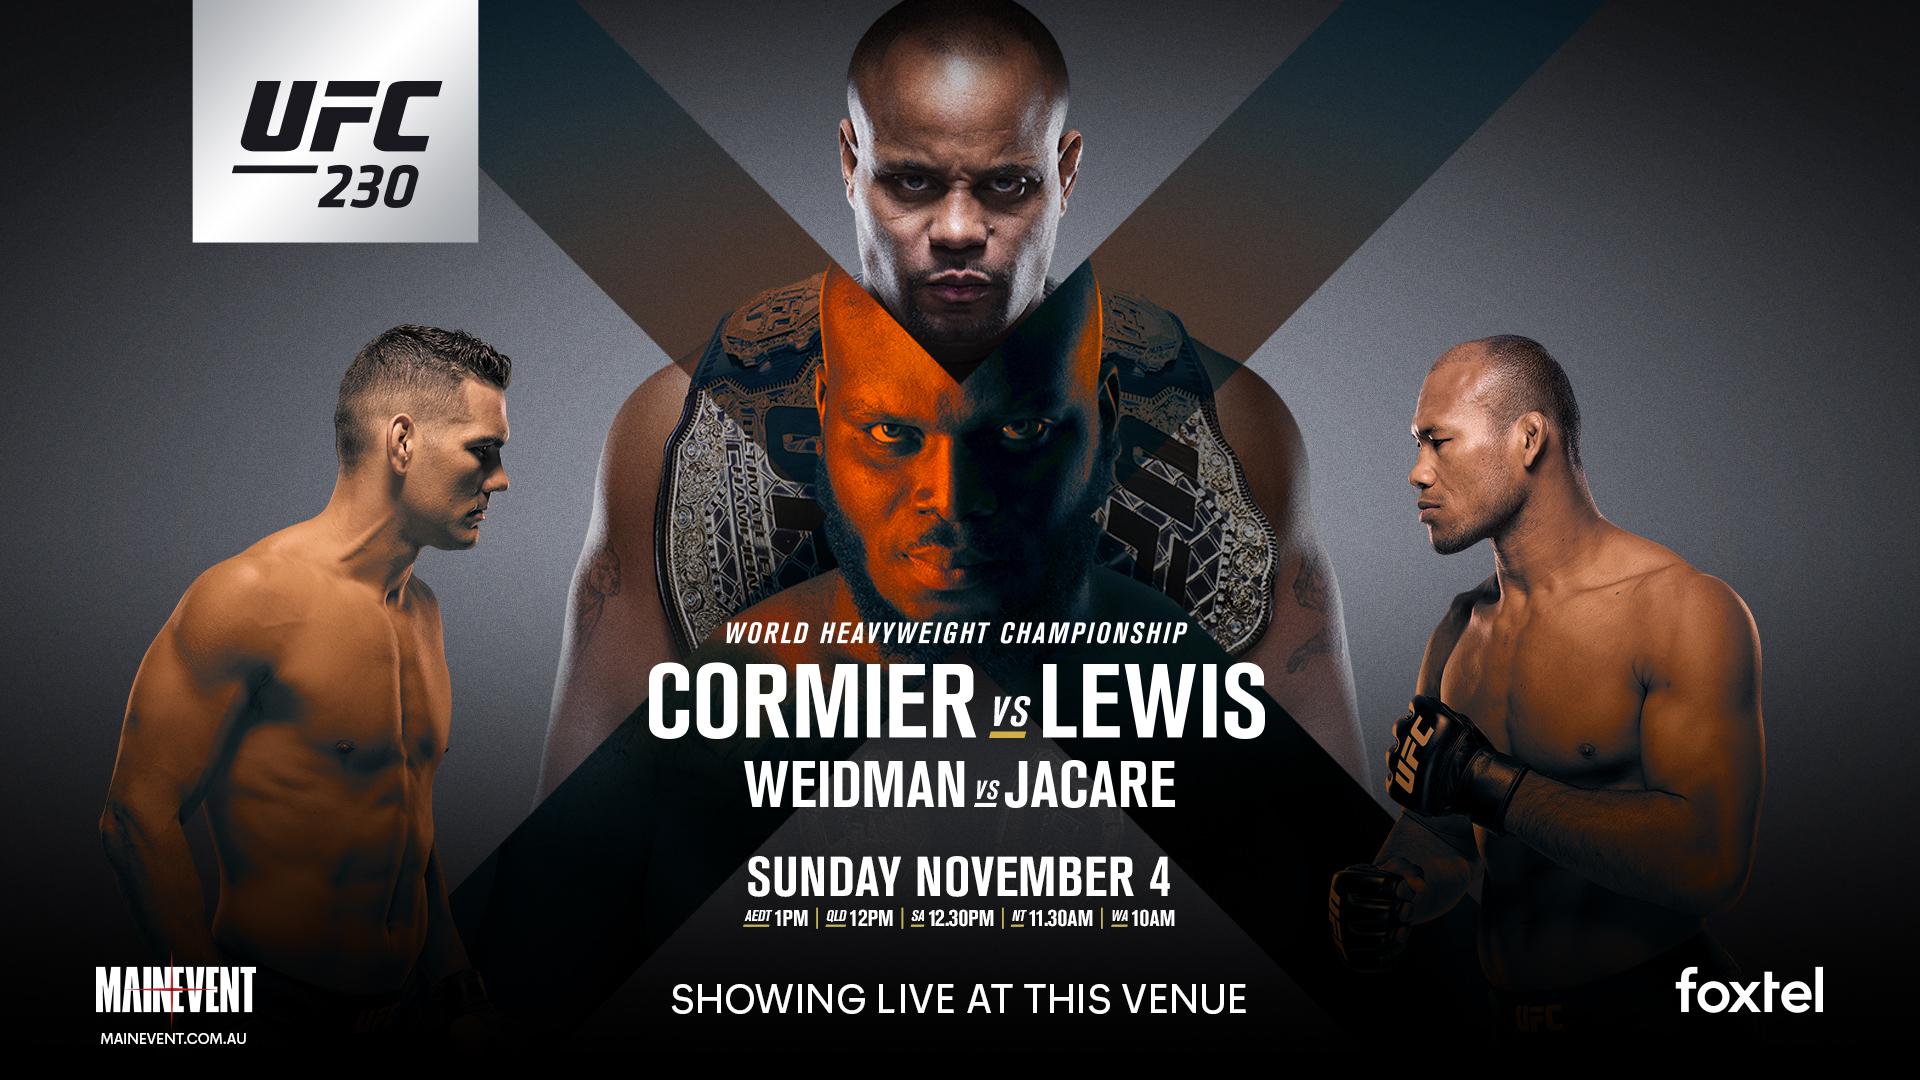 UFC230_FOXSPORTS_16x9_hori.jpg